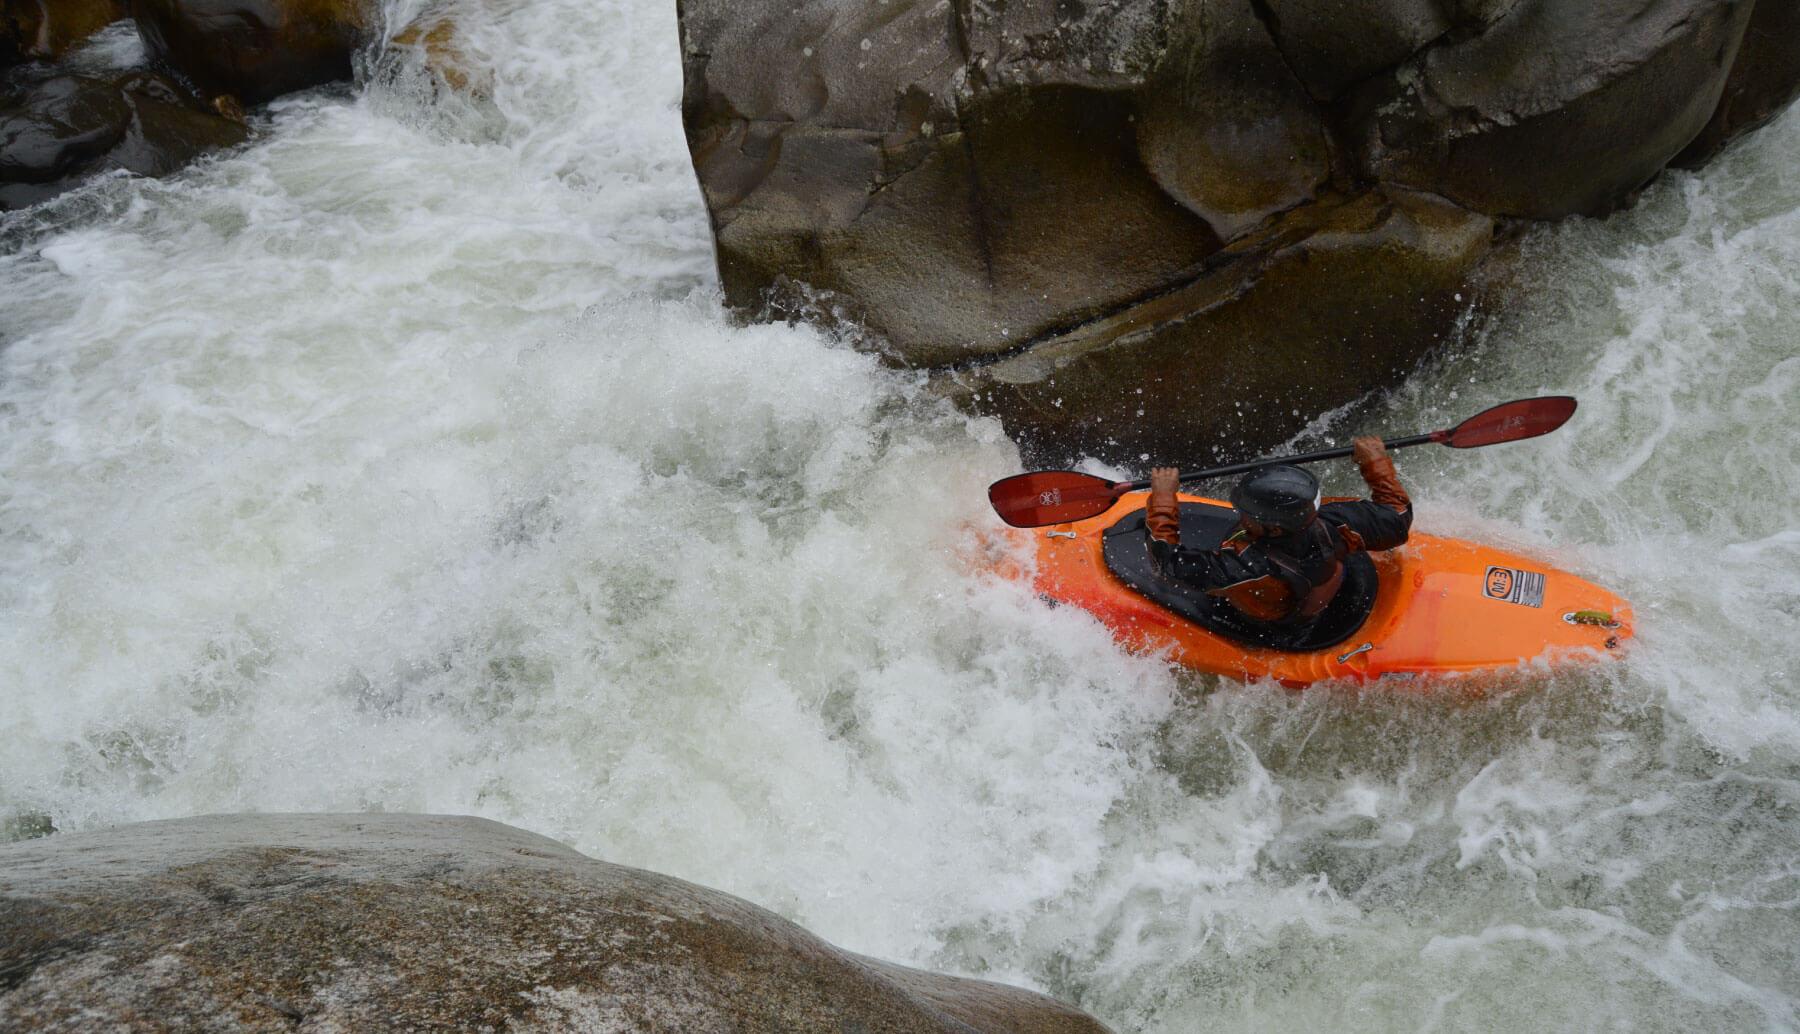 Kayak adventure some rapids